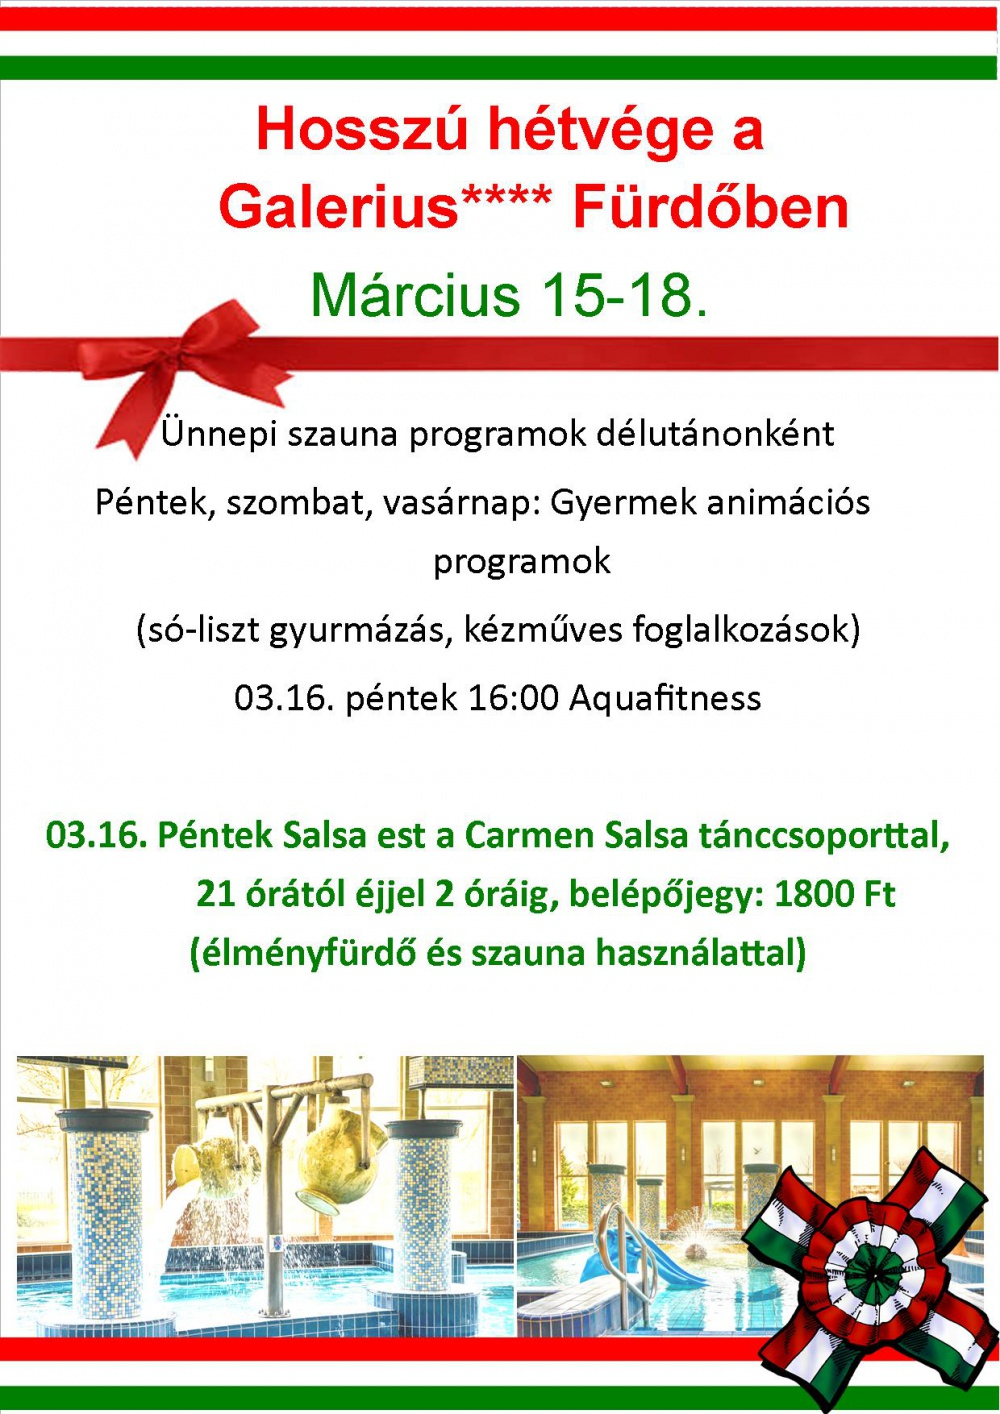 Hosszú hétvége Salsa esttel a Galerius Fürdőben